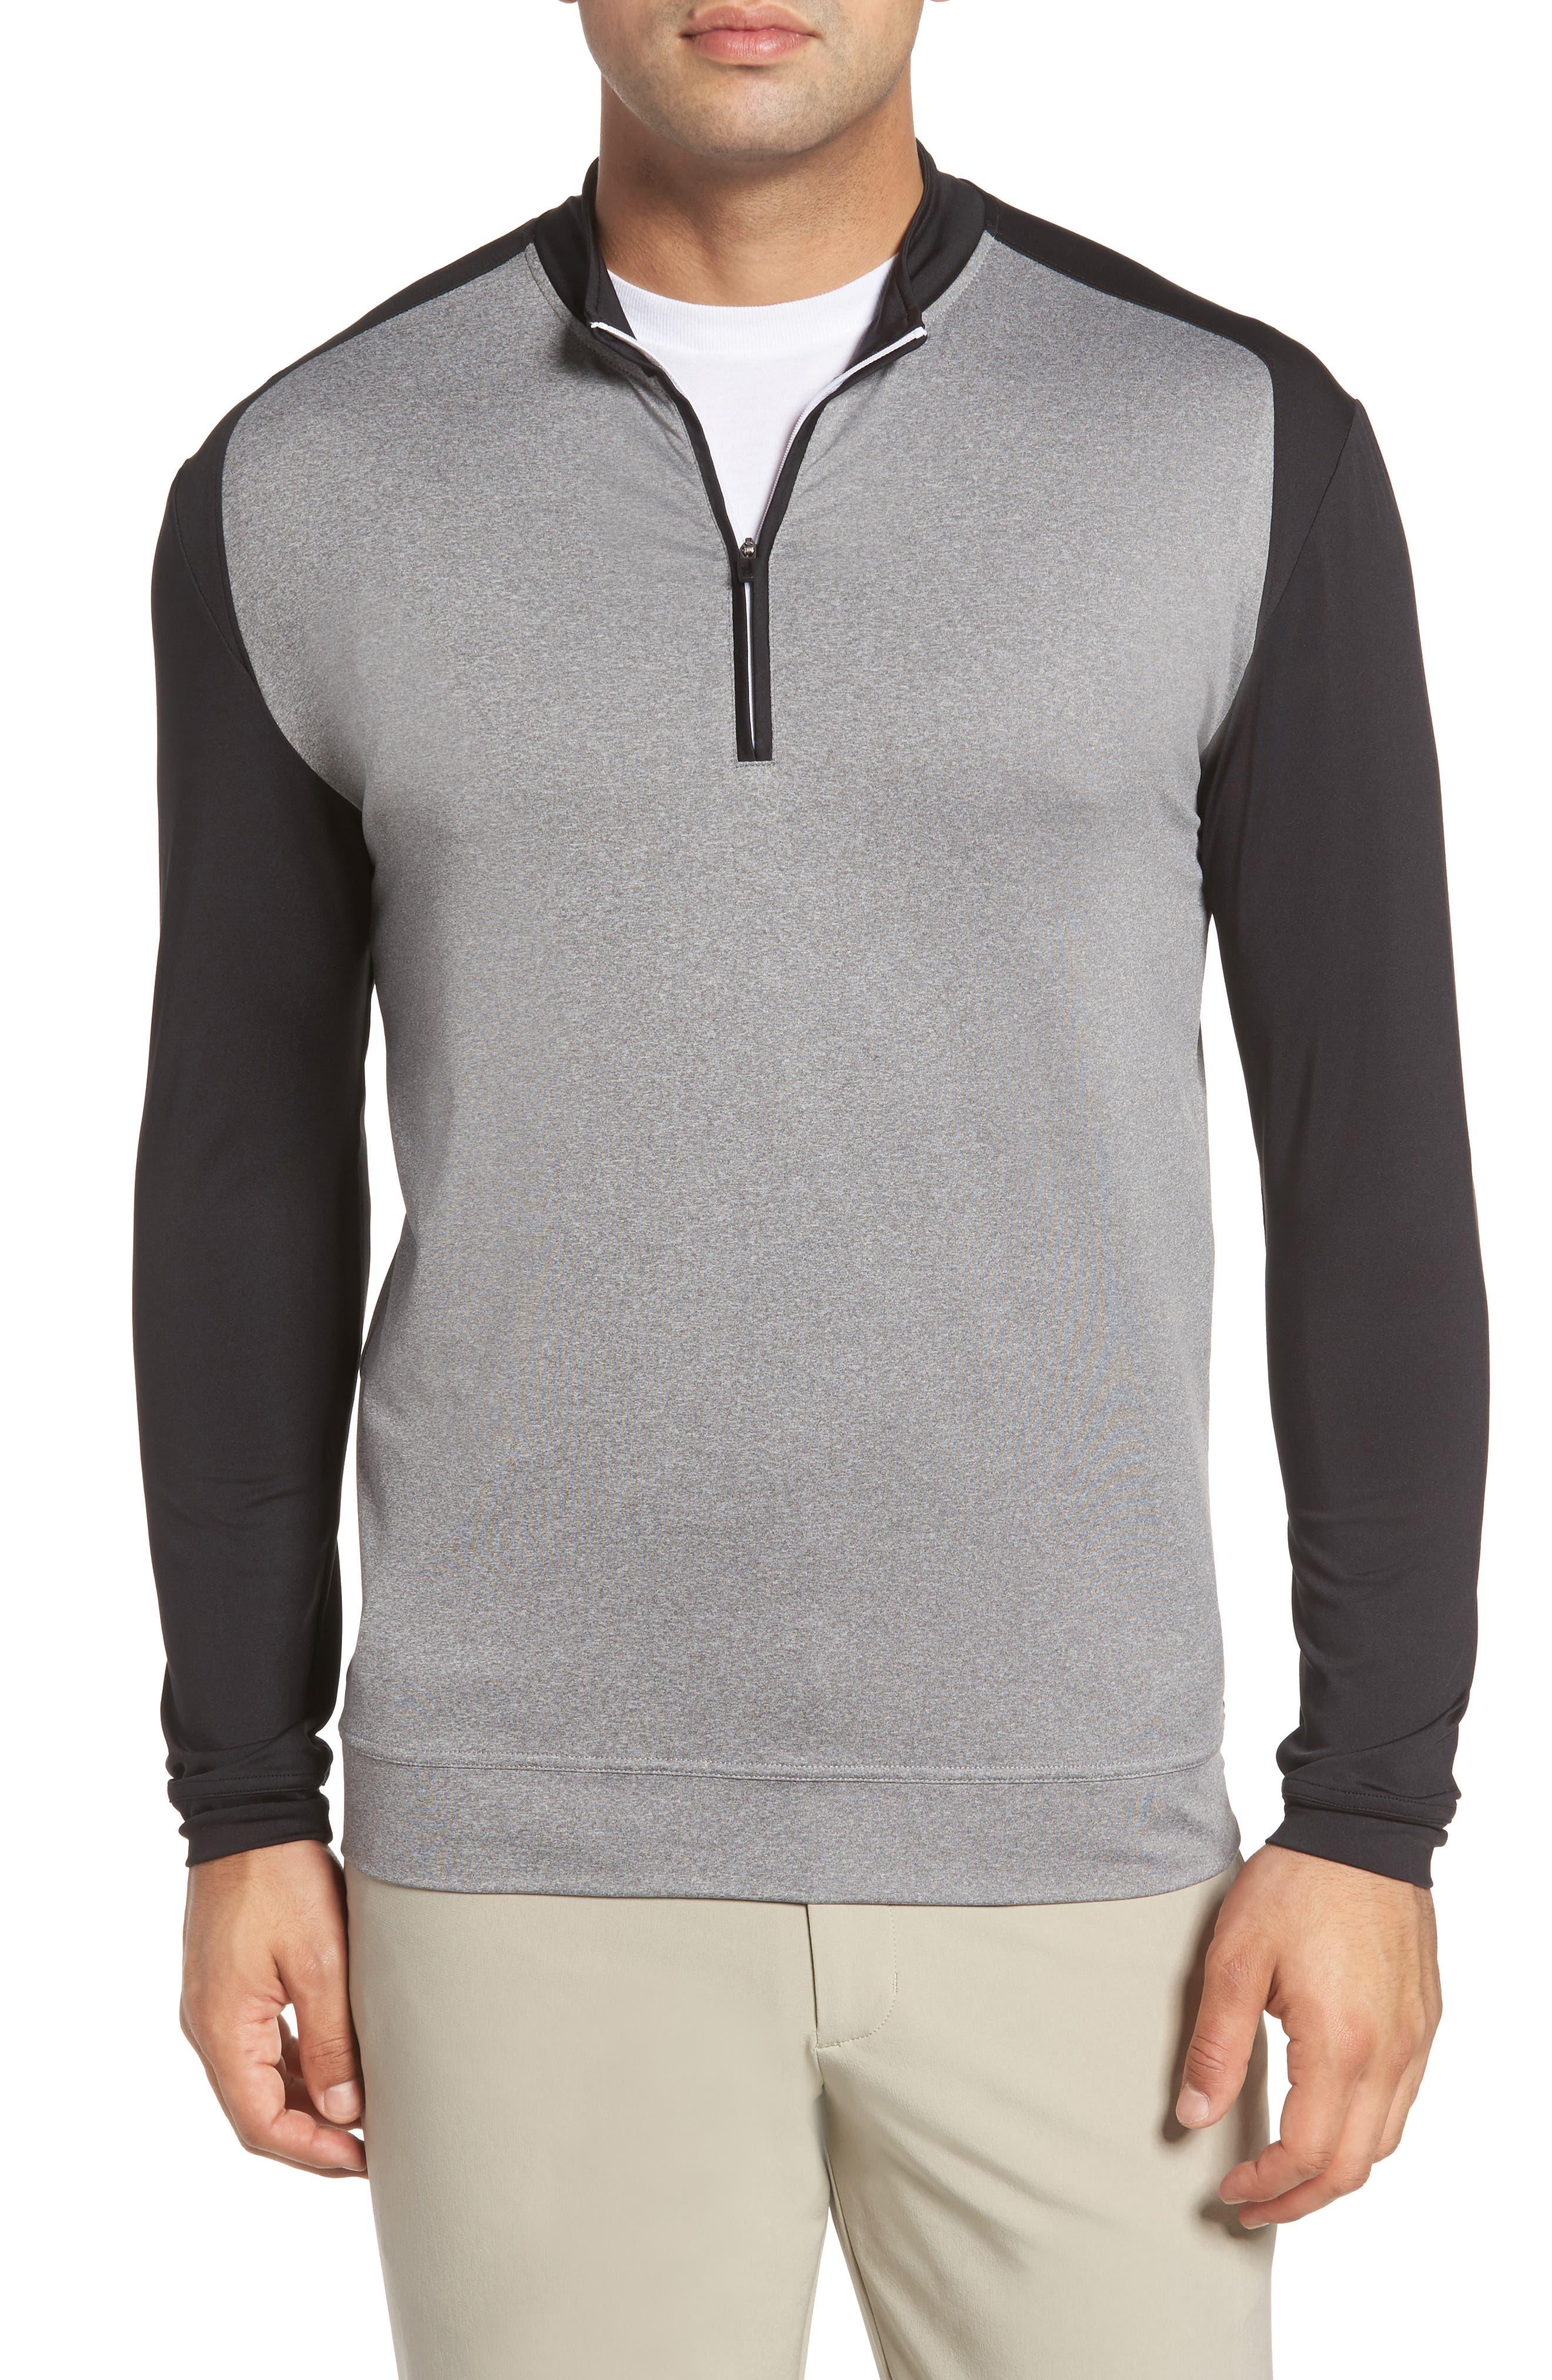 Sway Classic Fit Zip Raglan Pullover,                             Main thumbnail 1, color,                             Black